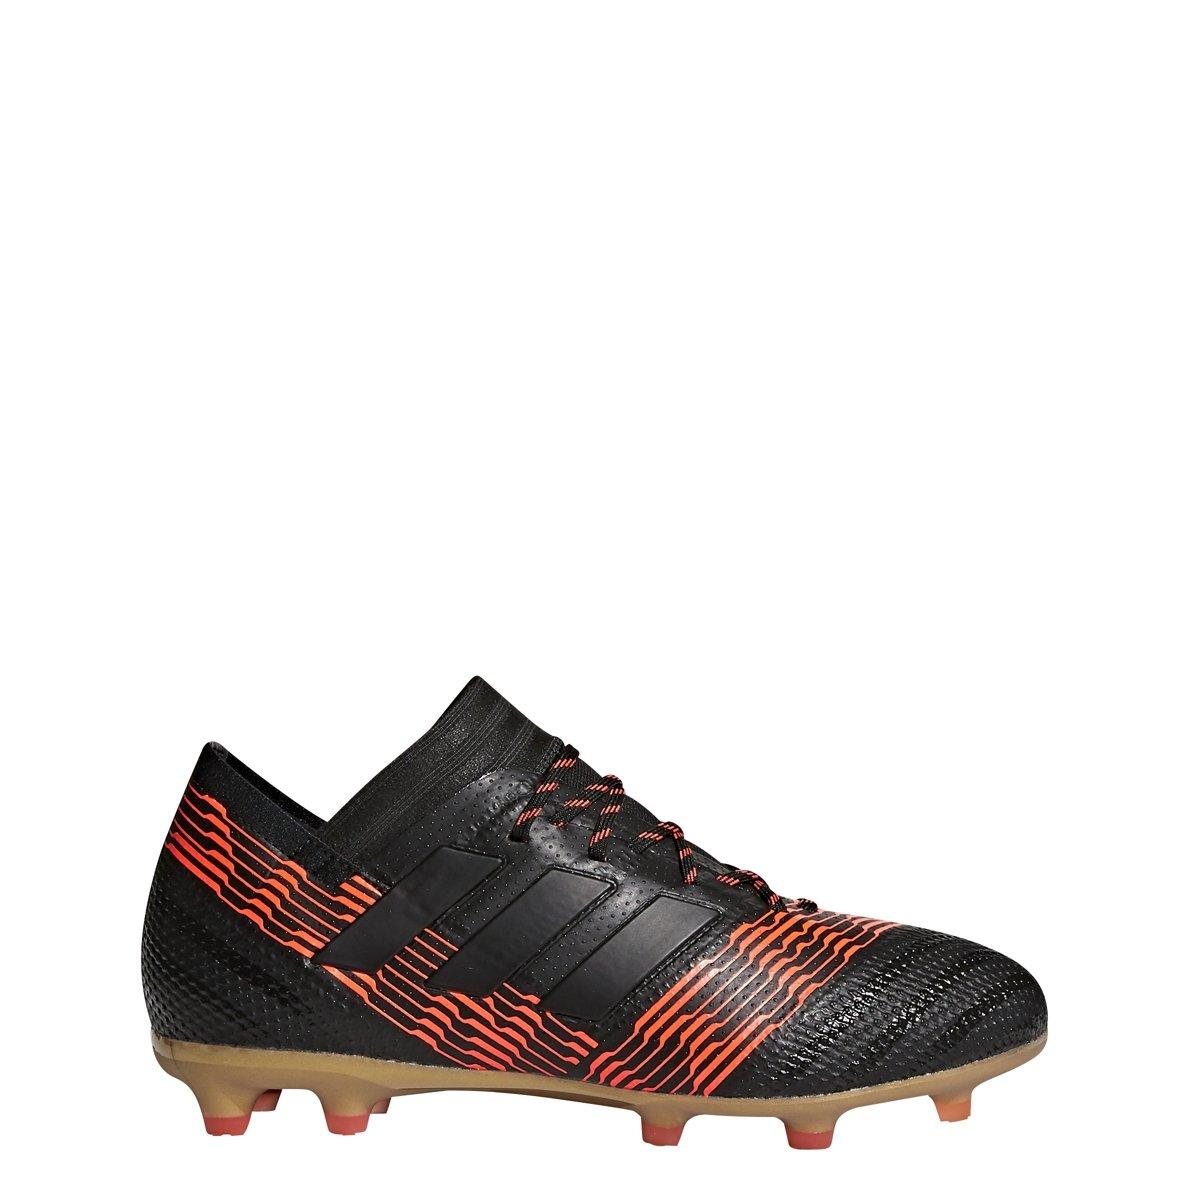 adidas Nemeziz 17.1 FG Jr Kids Soccer Cleats (3.5)